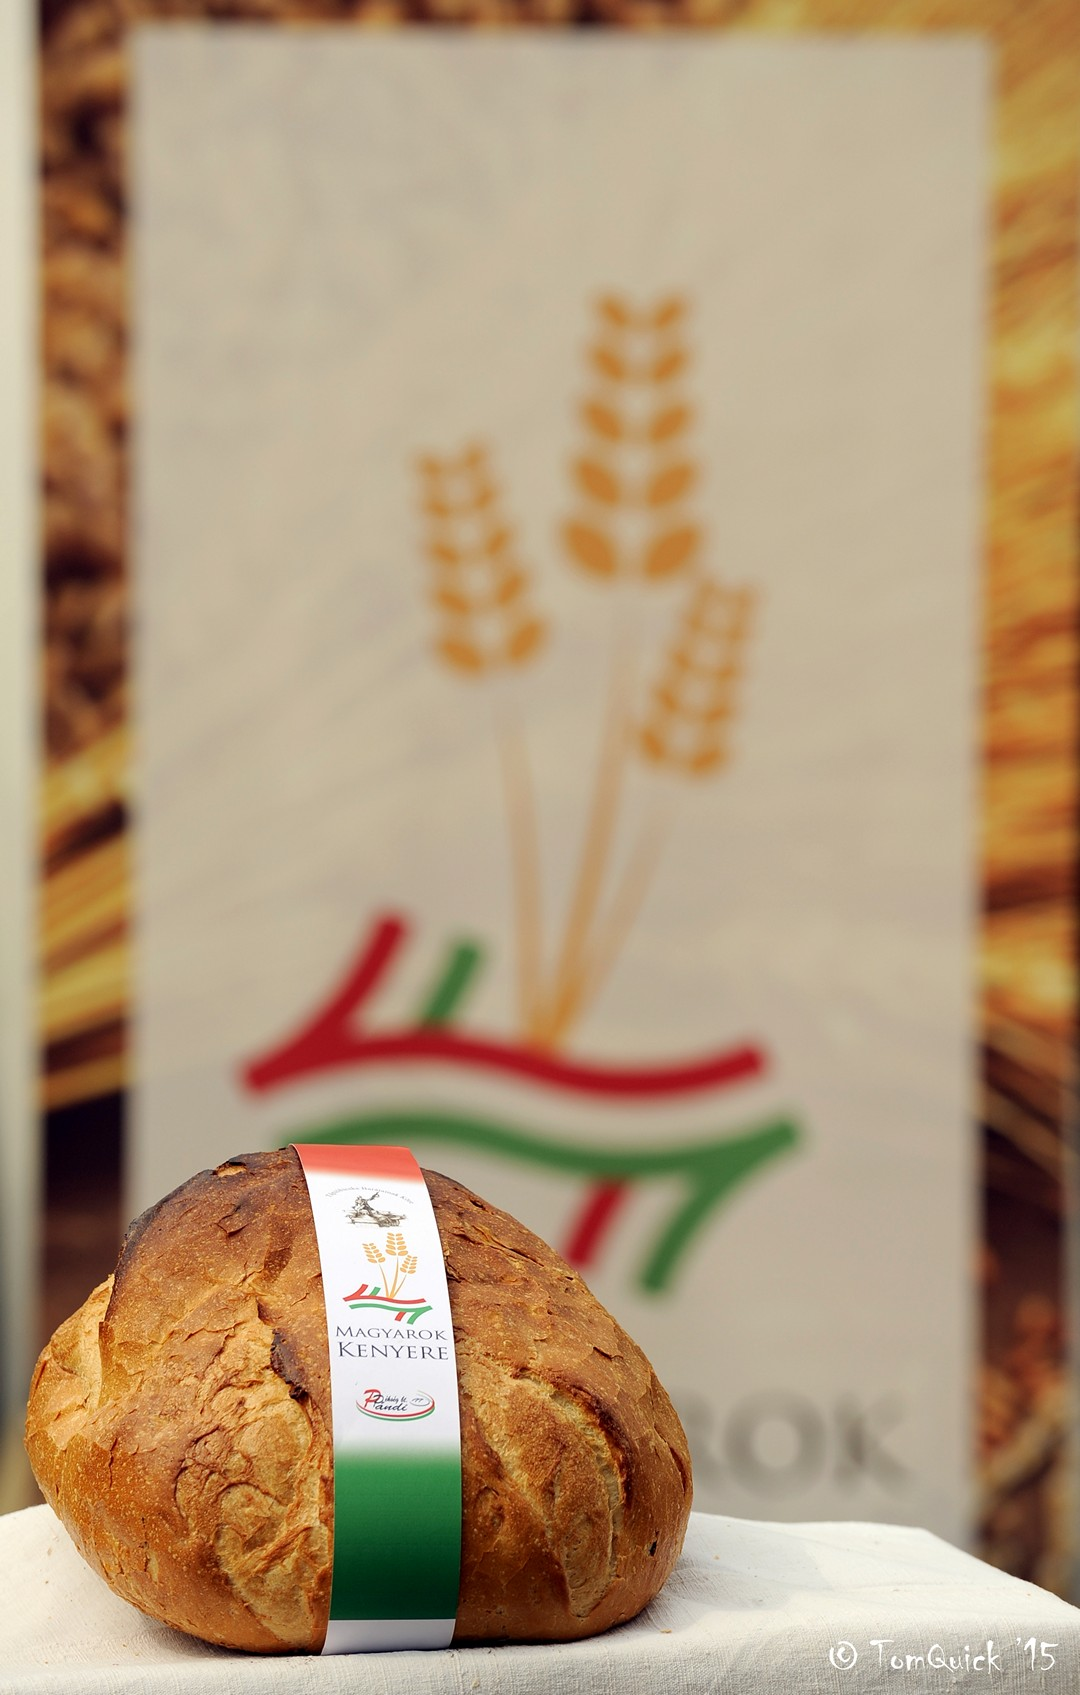 Magyarok kenyere